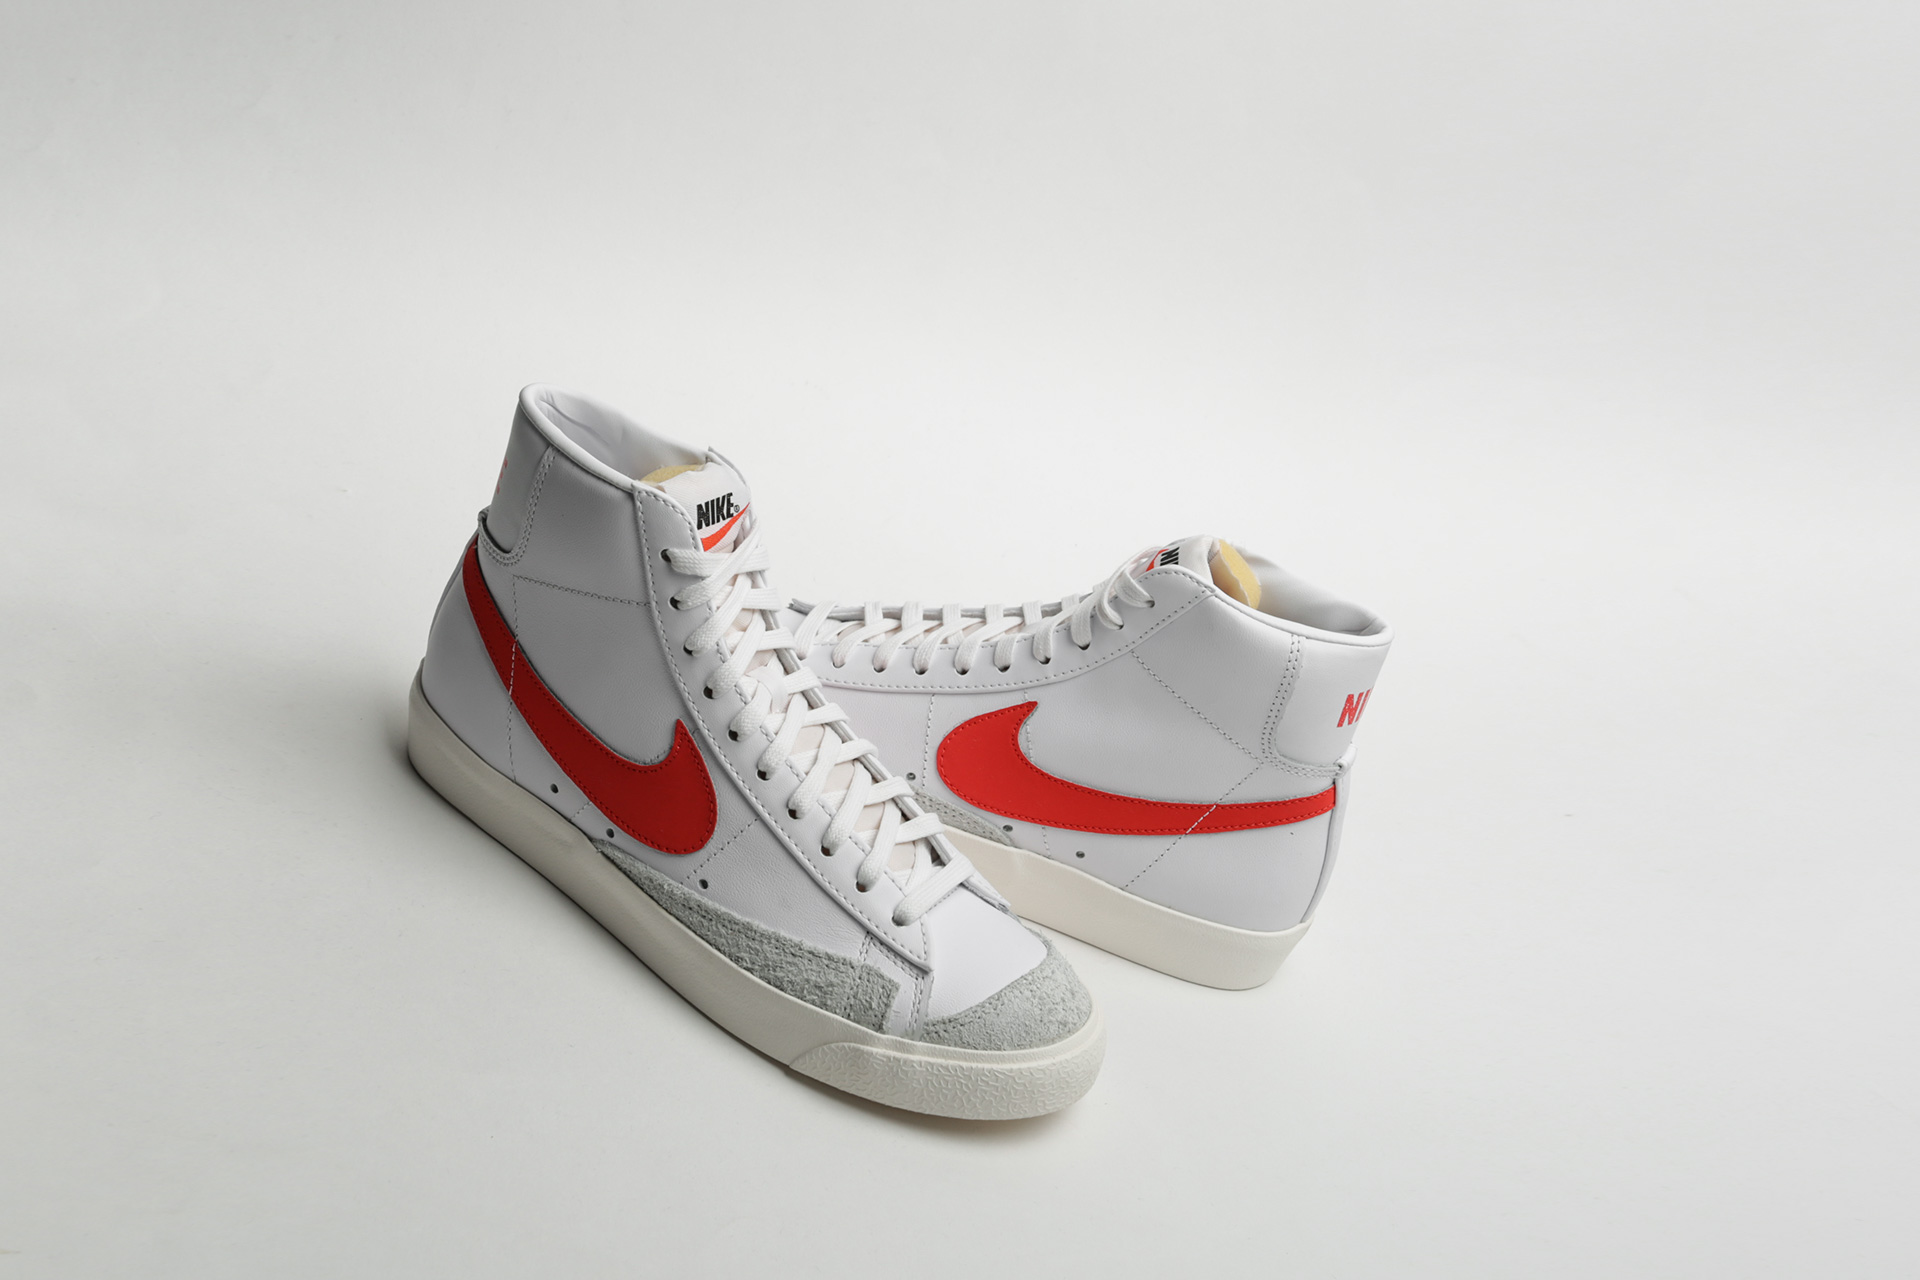 b3a1b533 Купить белые кроссовки Blazer Mid '77 VNTG от Nike (BQ6806-600) по ...